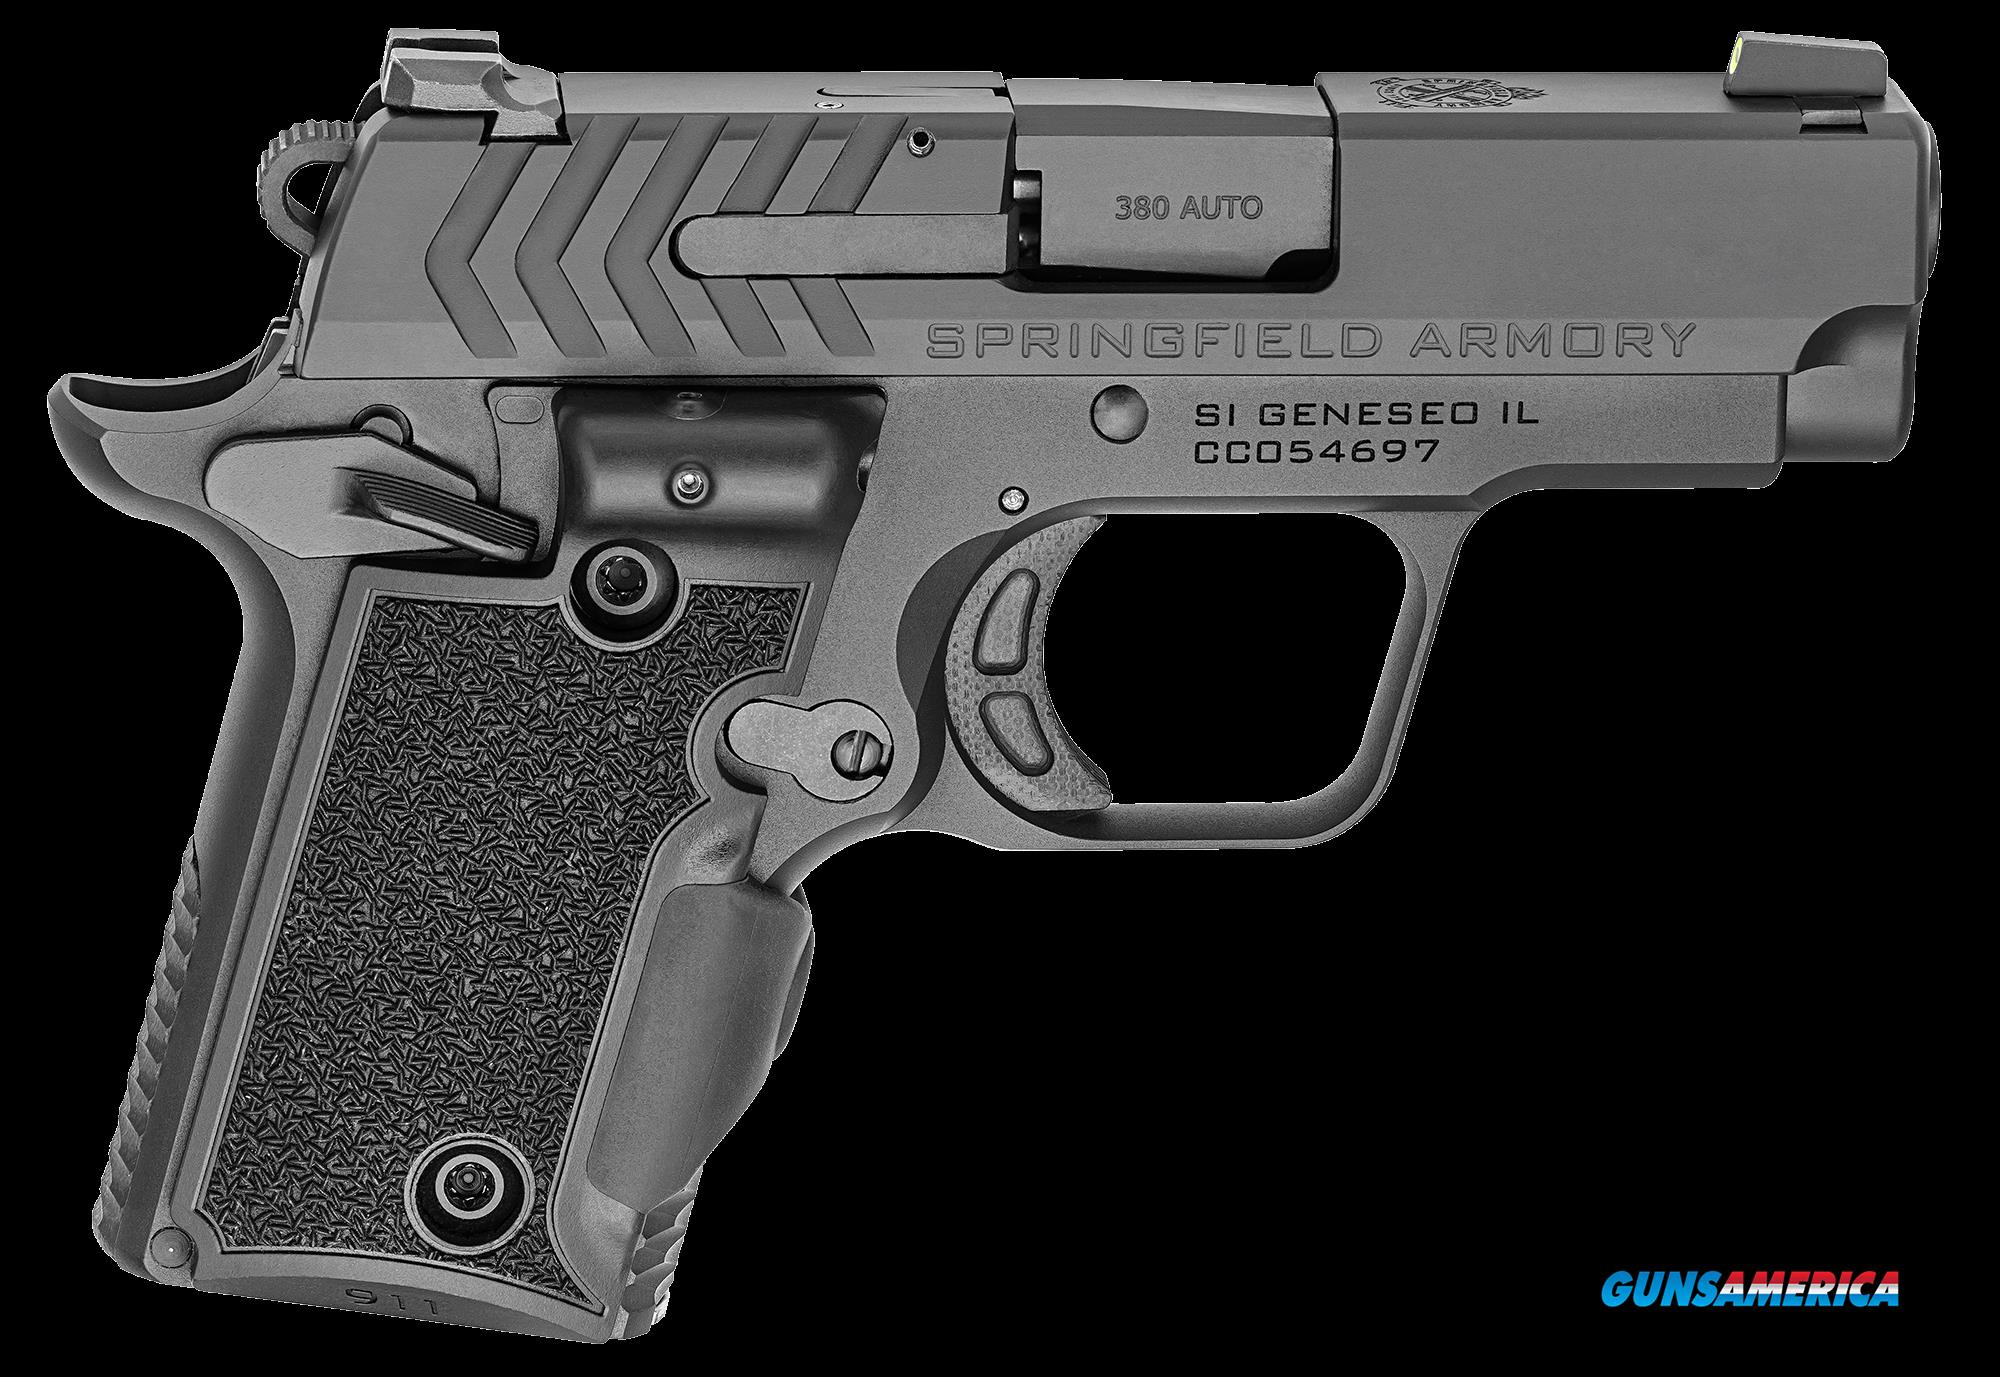 Springfield Armory 911, Spg Pg9109vg      380 911 Blk Grn Las  Guns > Pistols > 1911 Pistol Copies (non-Colt)